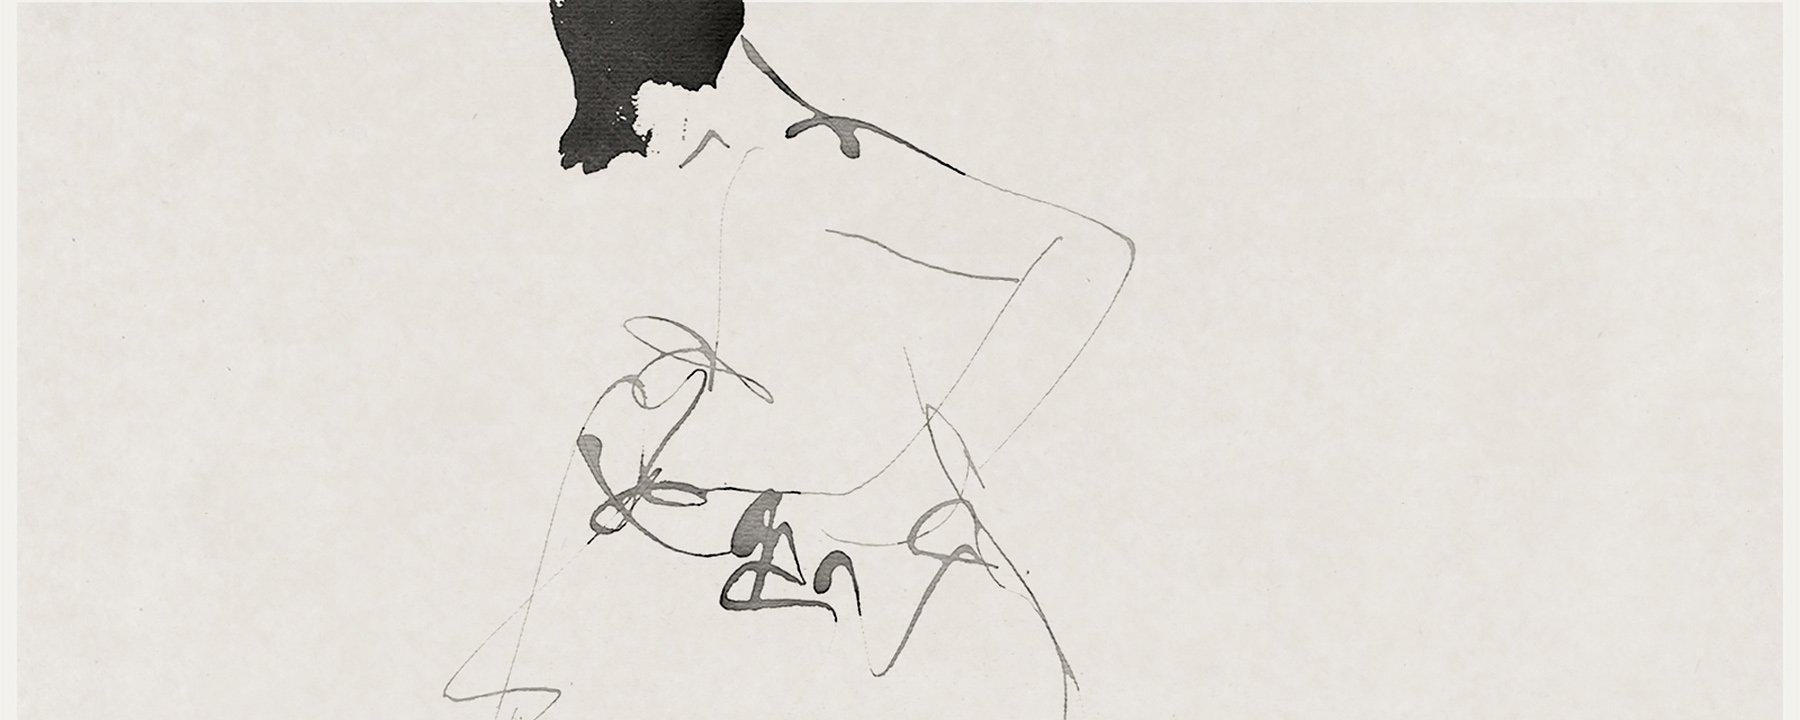 Aurore De La Morinerie's Calligraphic Figures